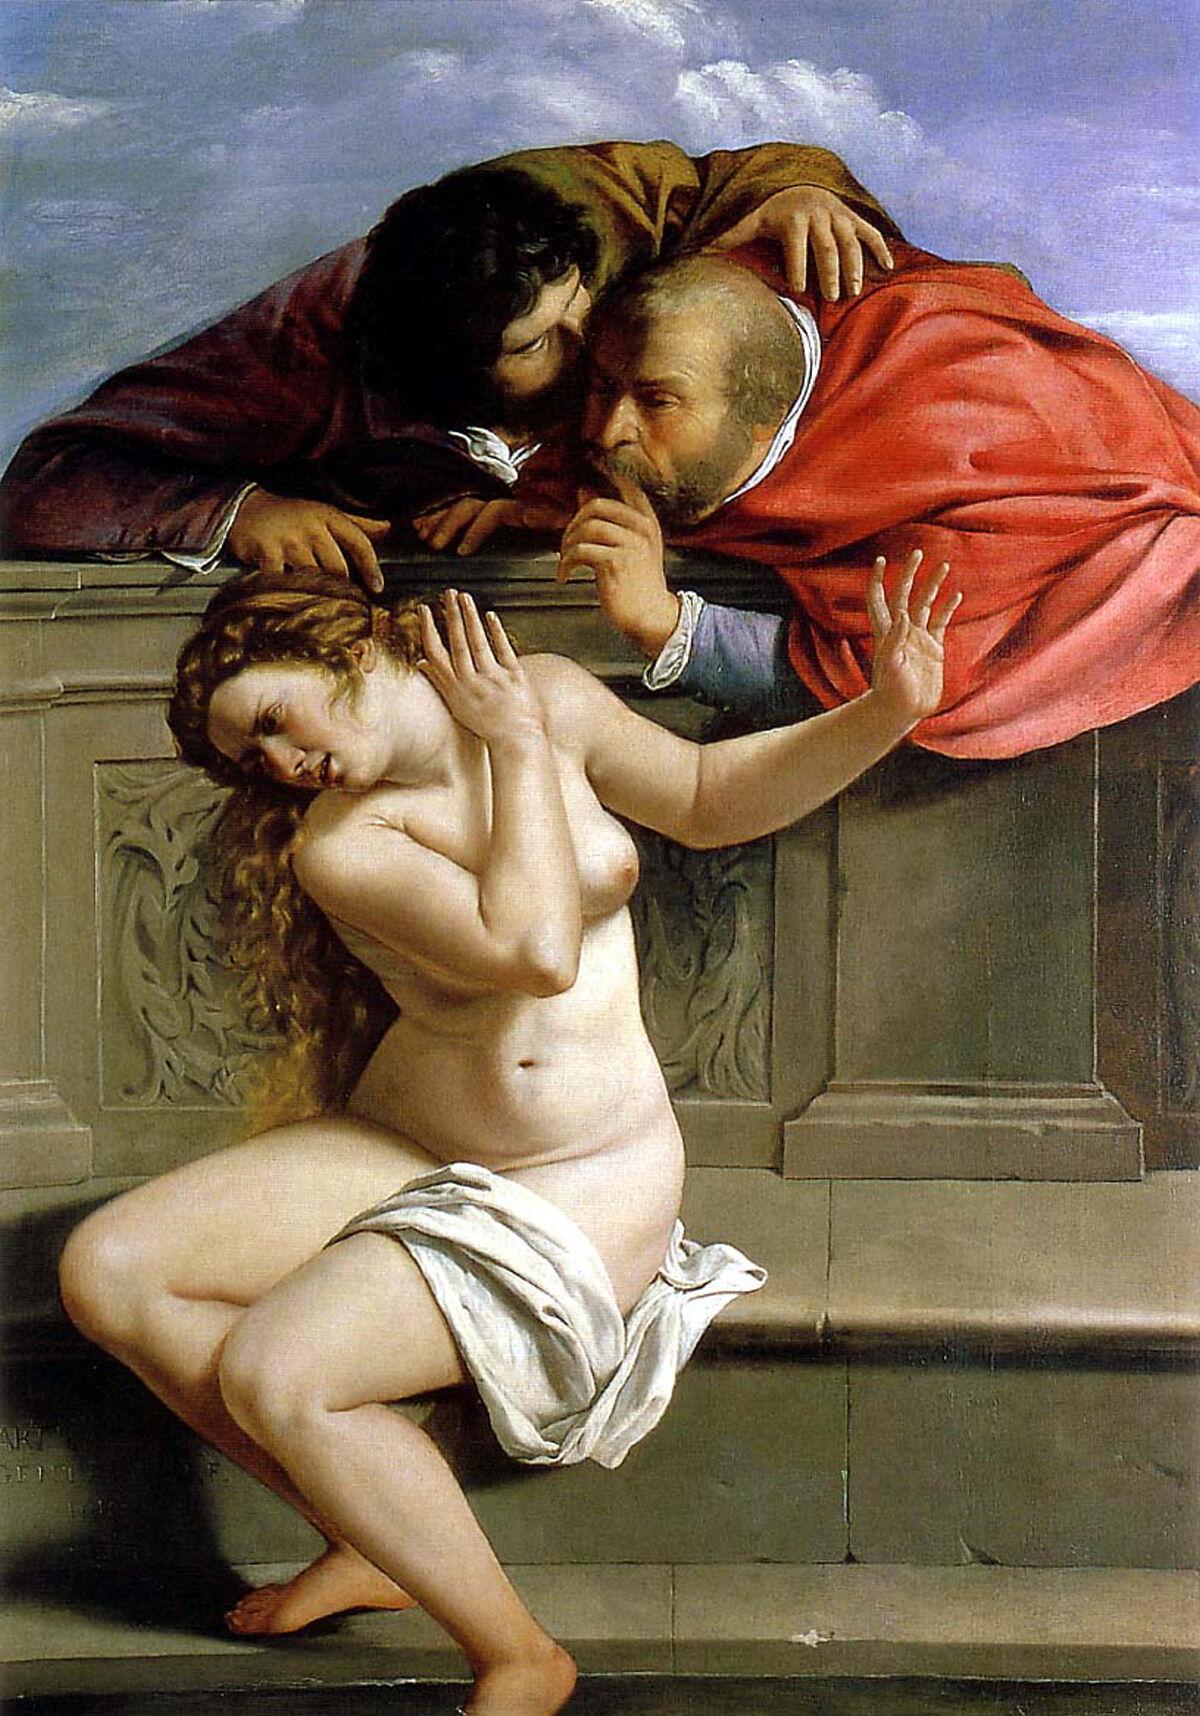 Artemisia Gentileschi, Susanna and the Elders, 1610. Photo via Wikimedia Commons.